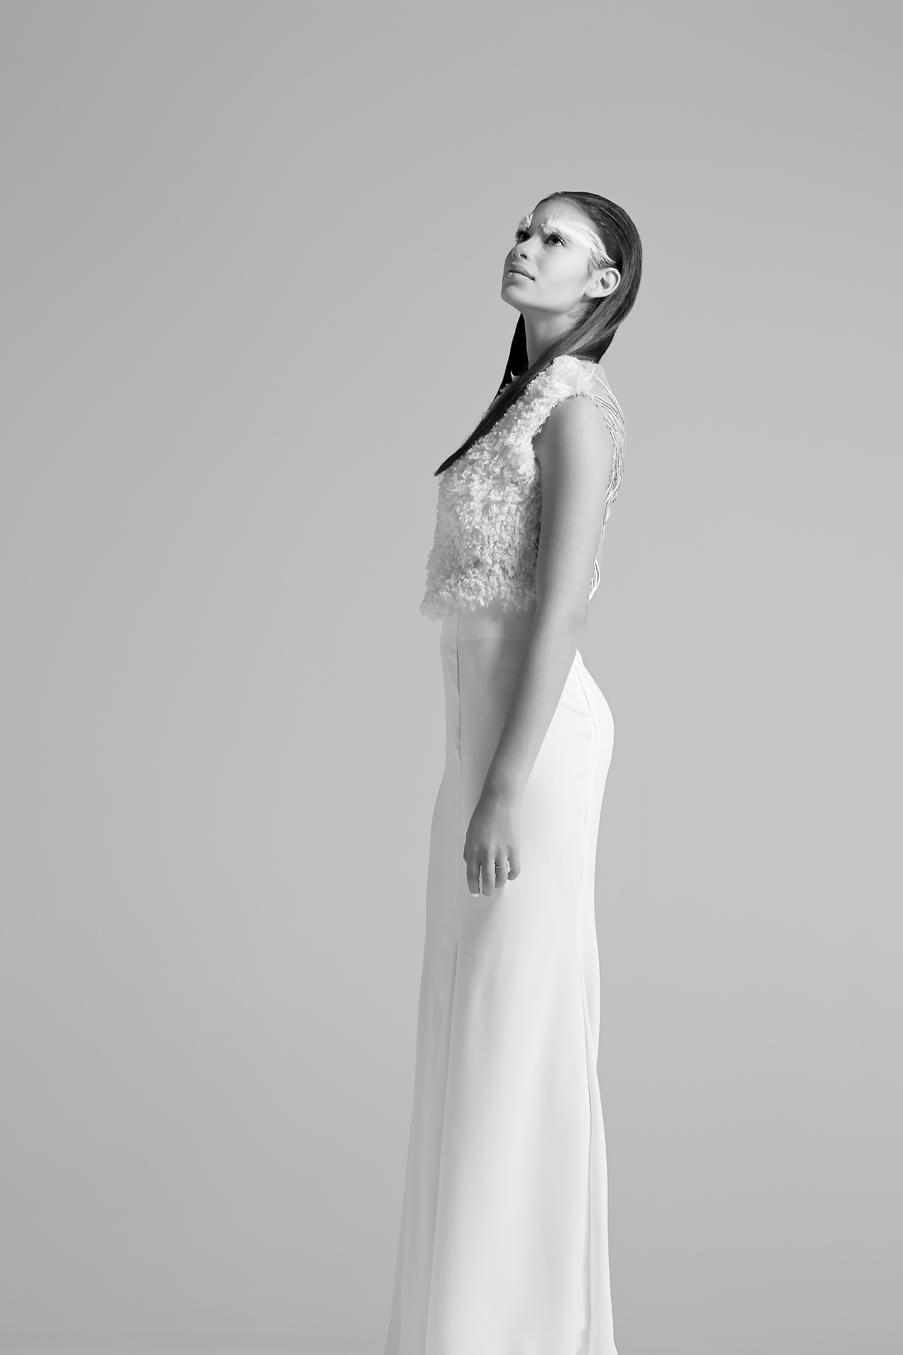 fotografo moda roma beauty fashion lumina sense art lab6